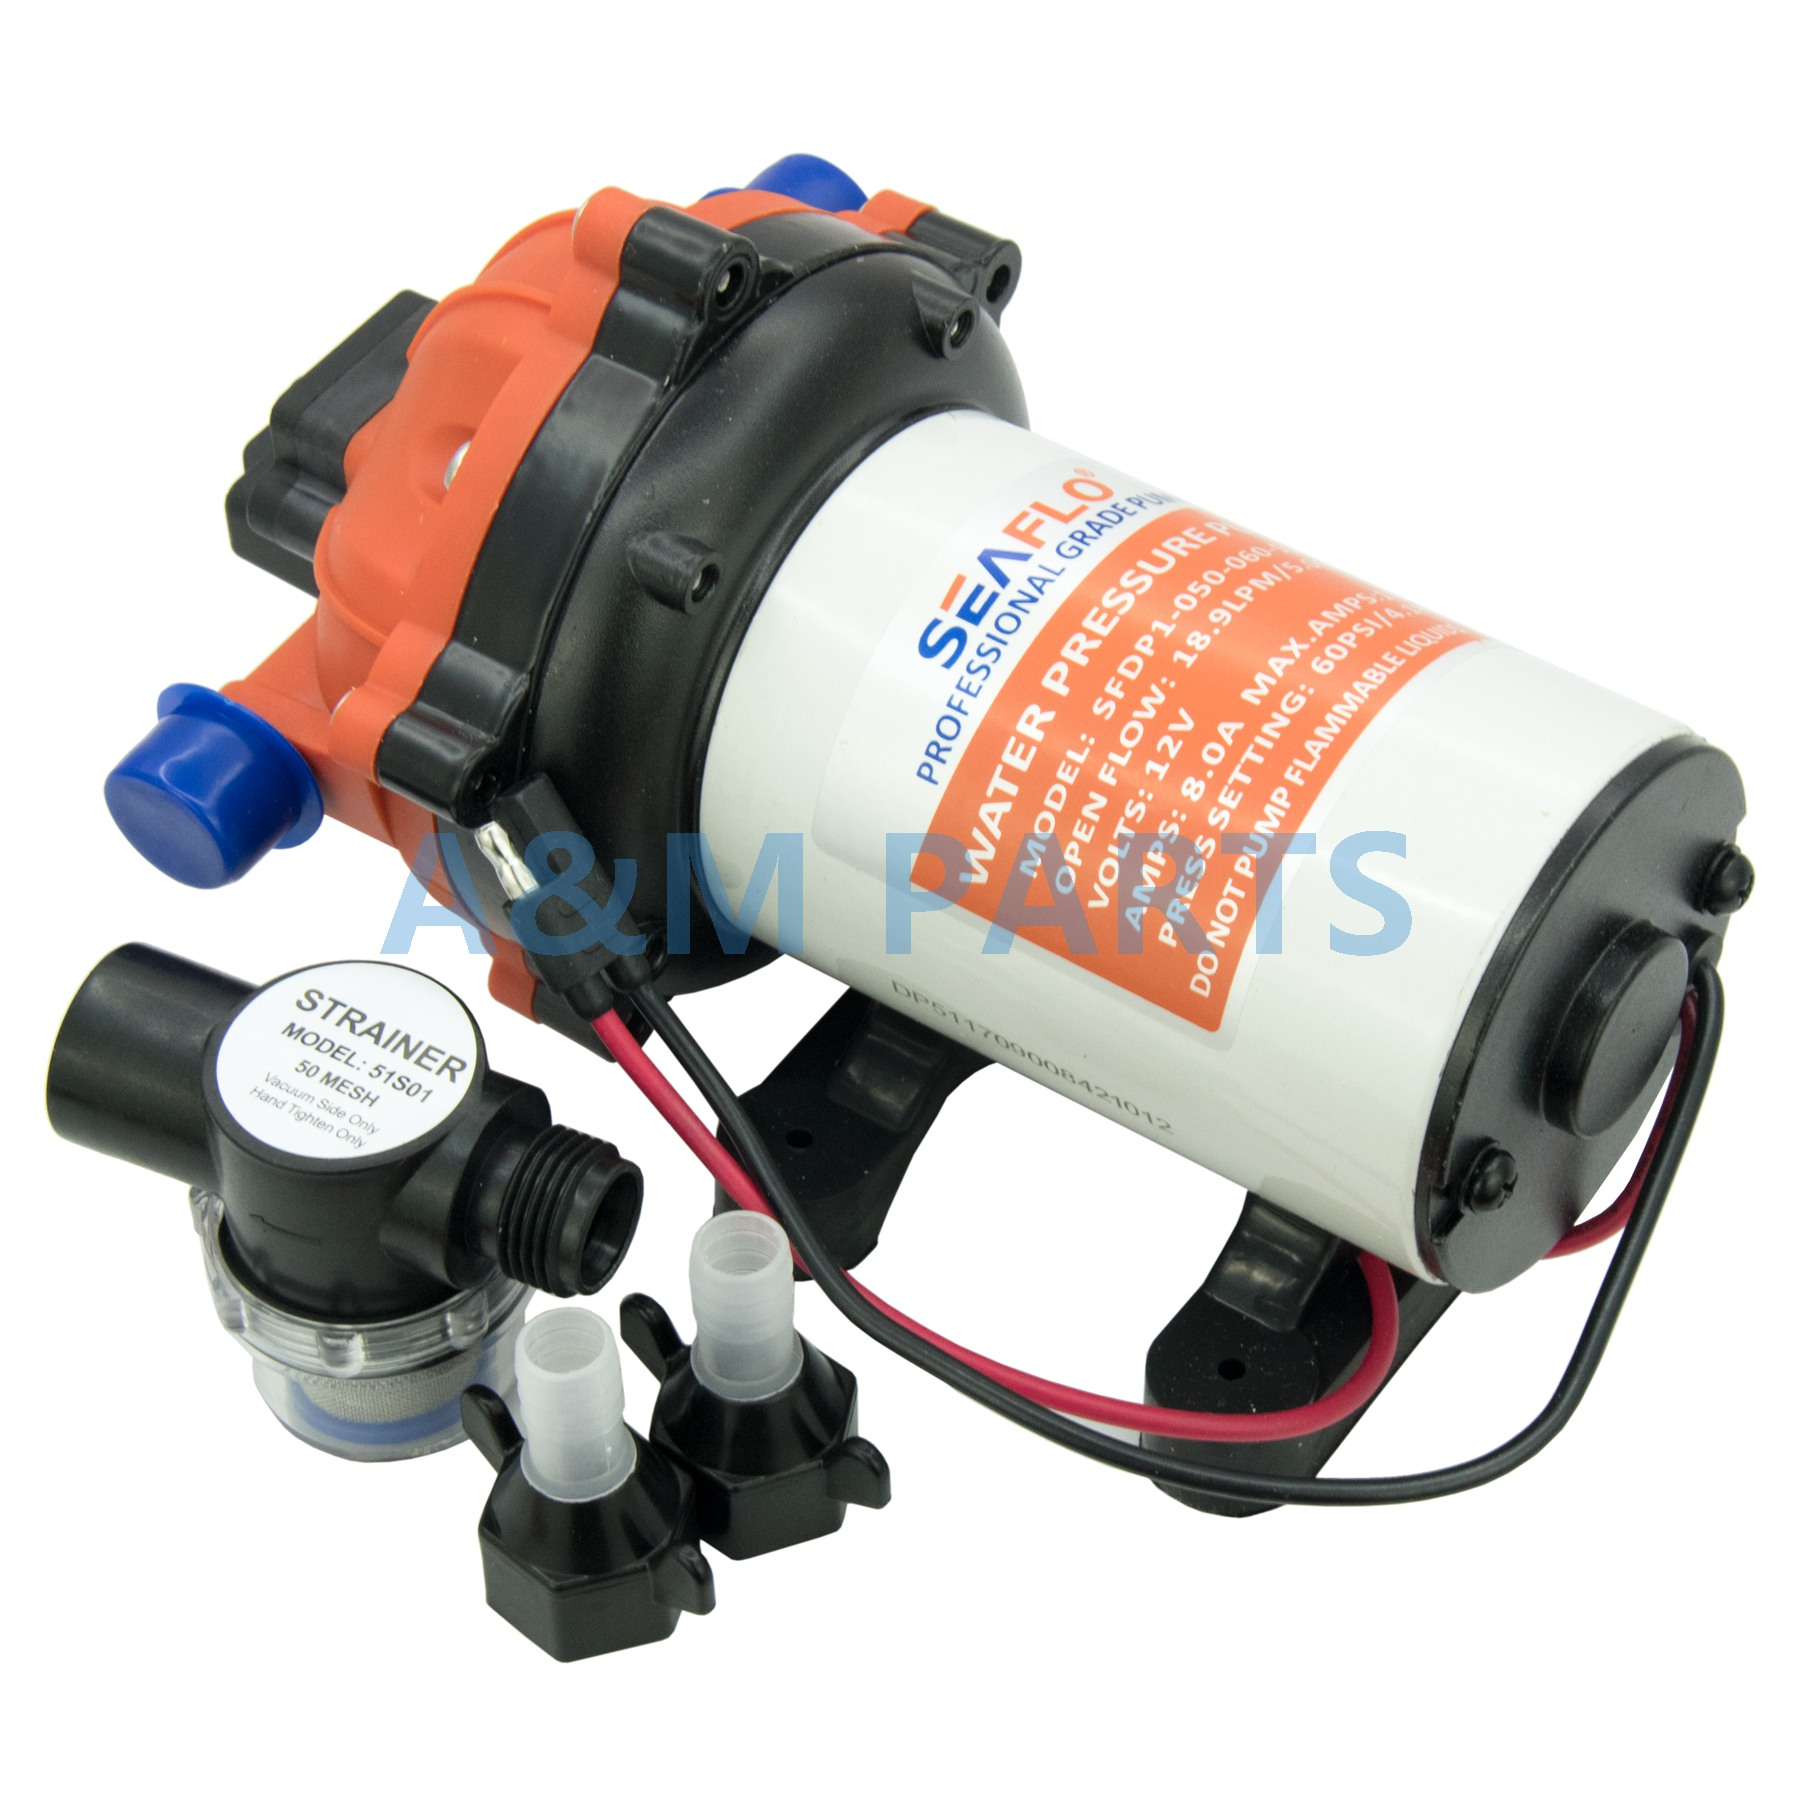 12V 60 PSI 5.0 GPM Self Priming Diaphragm Pump Boat Marine RV Water Pump